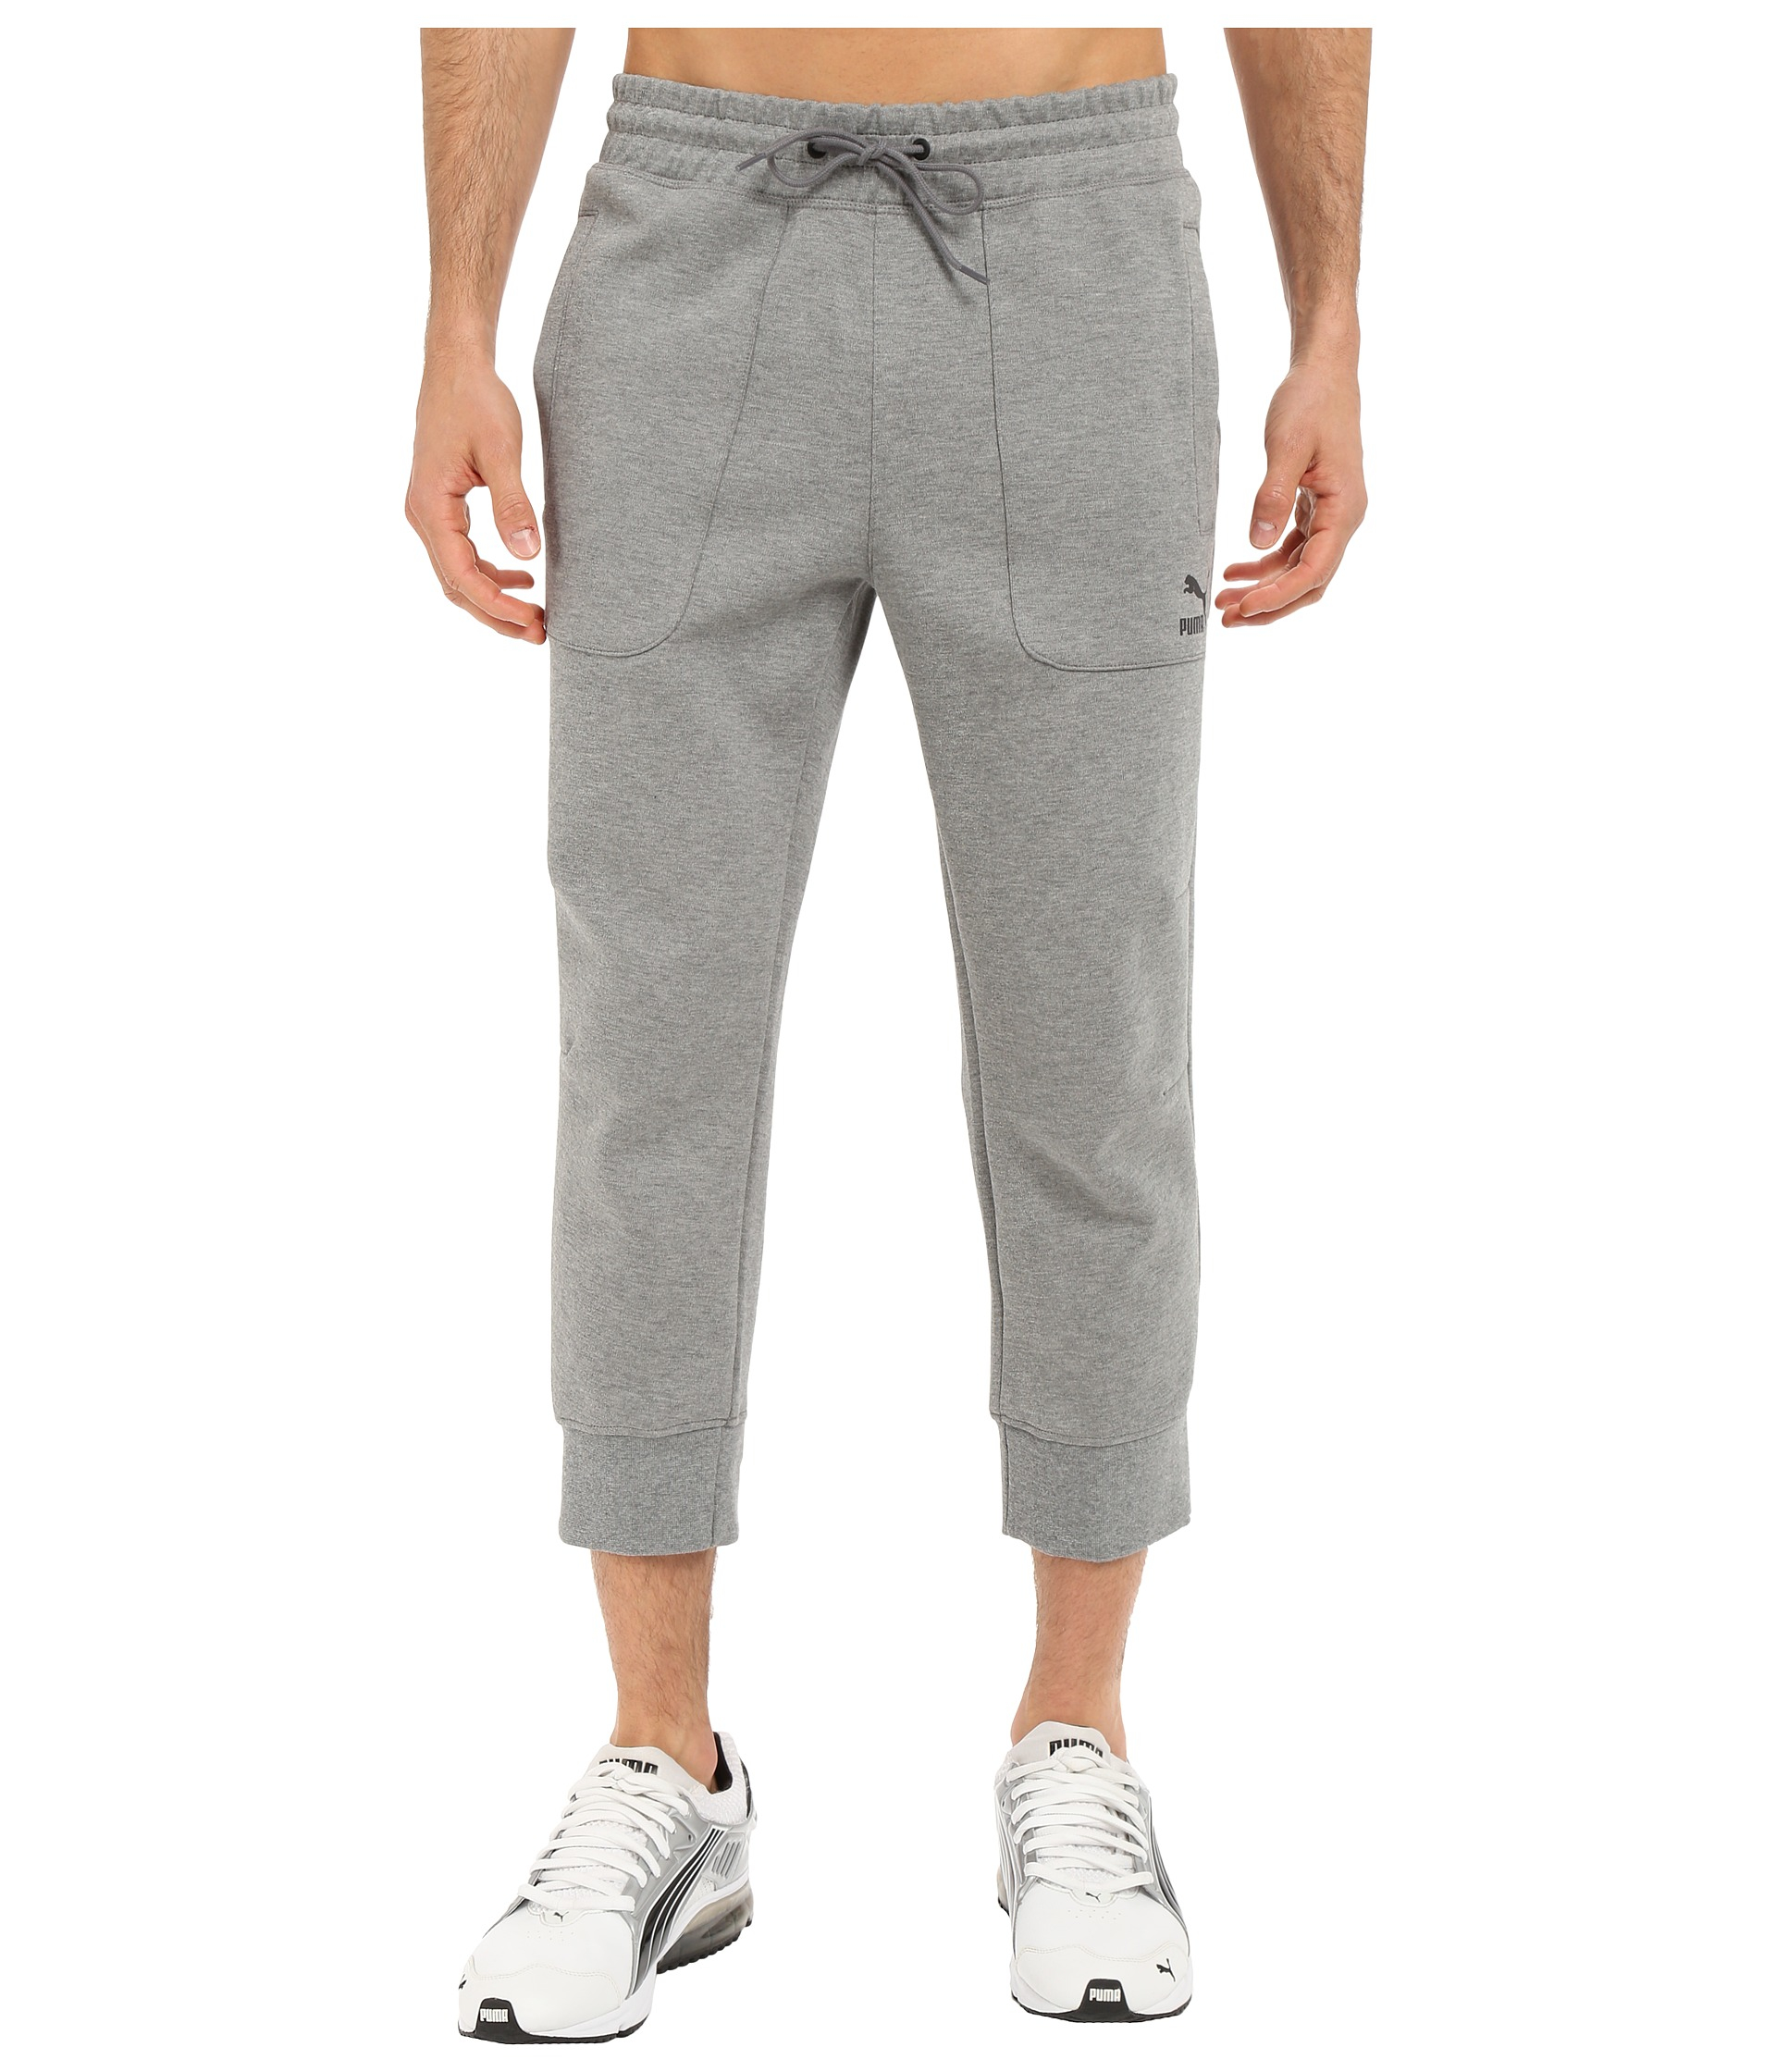 bad07388e6bd Lyst - PUMA Evo Sweat 3 4 Pants in Gray for Men